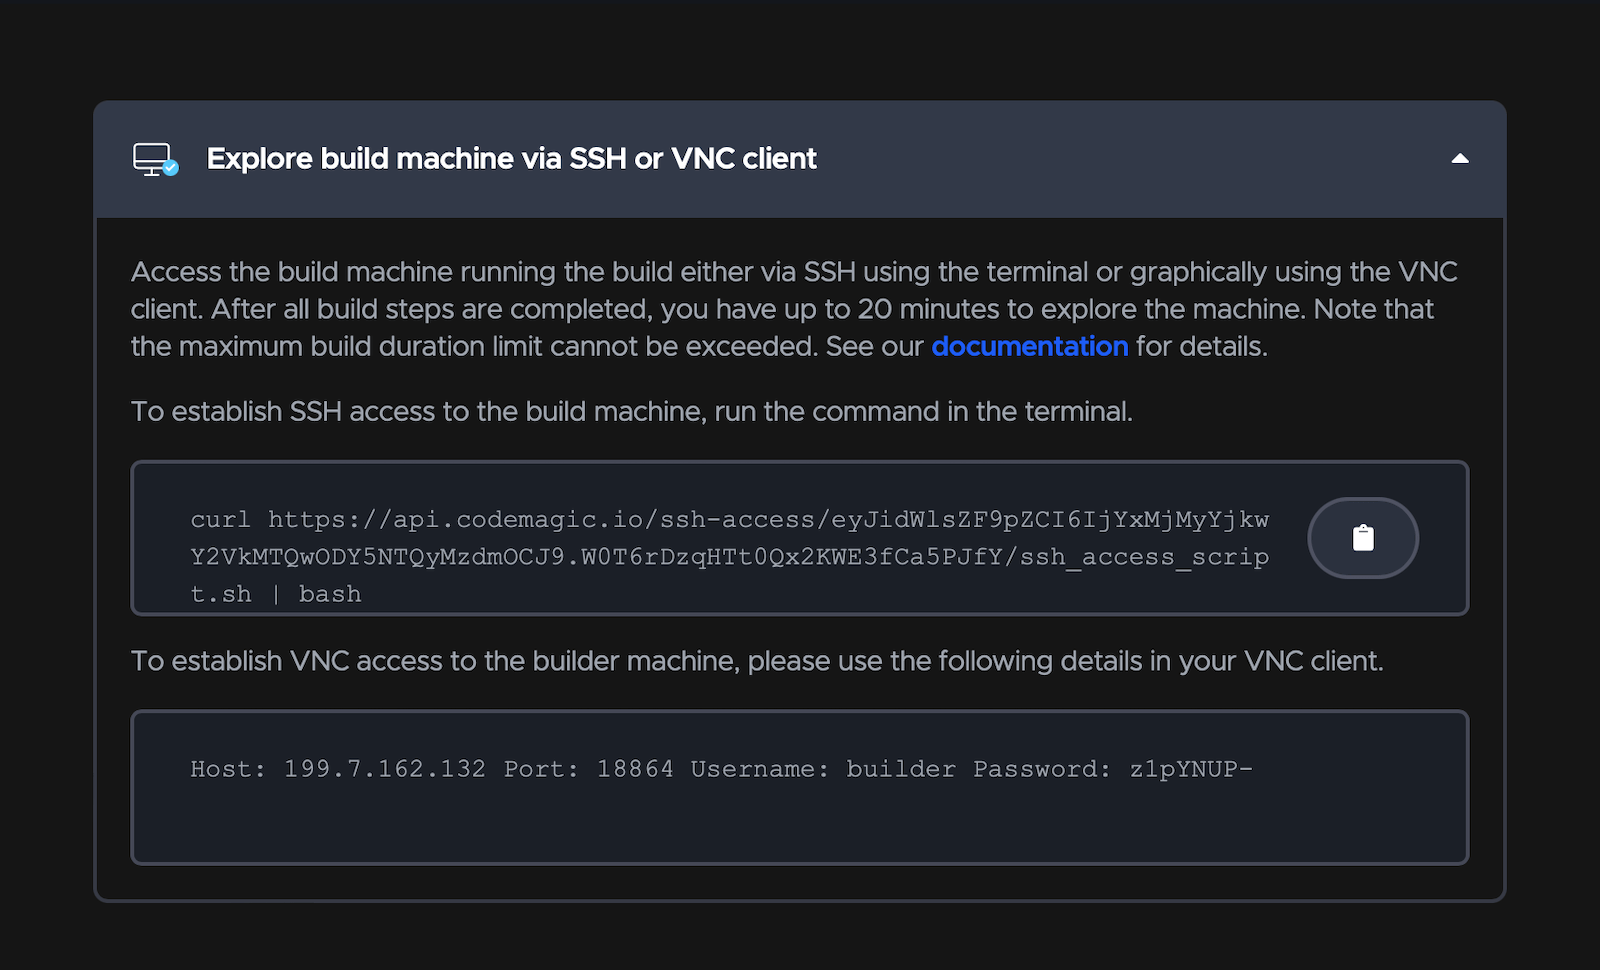 Codemagic remote: Access using SSH or VNC client